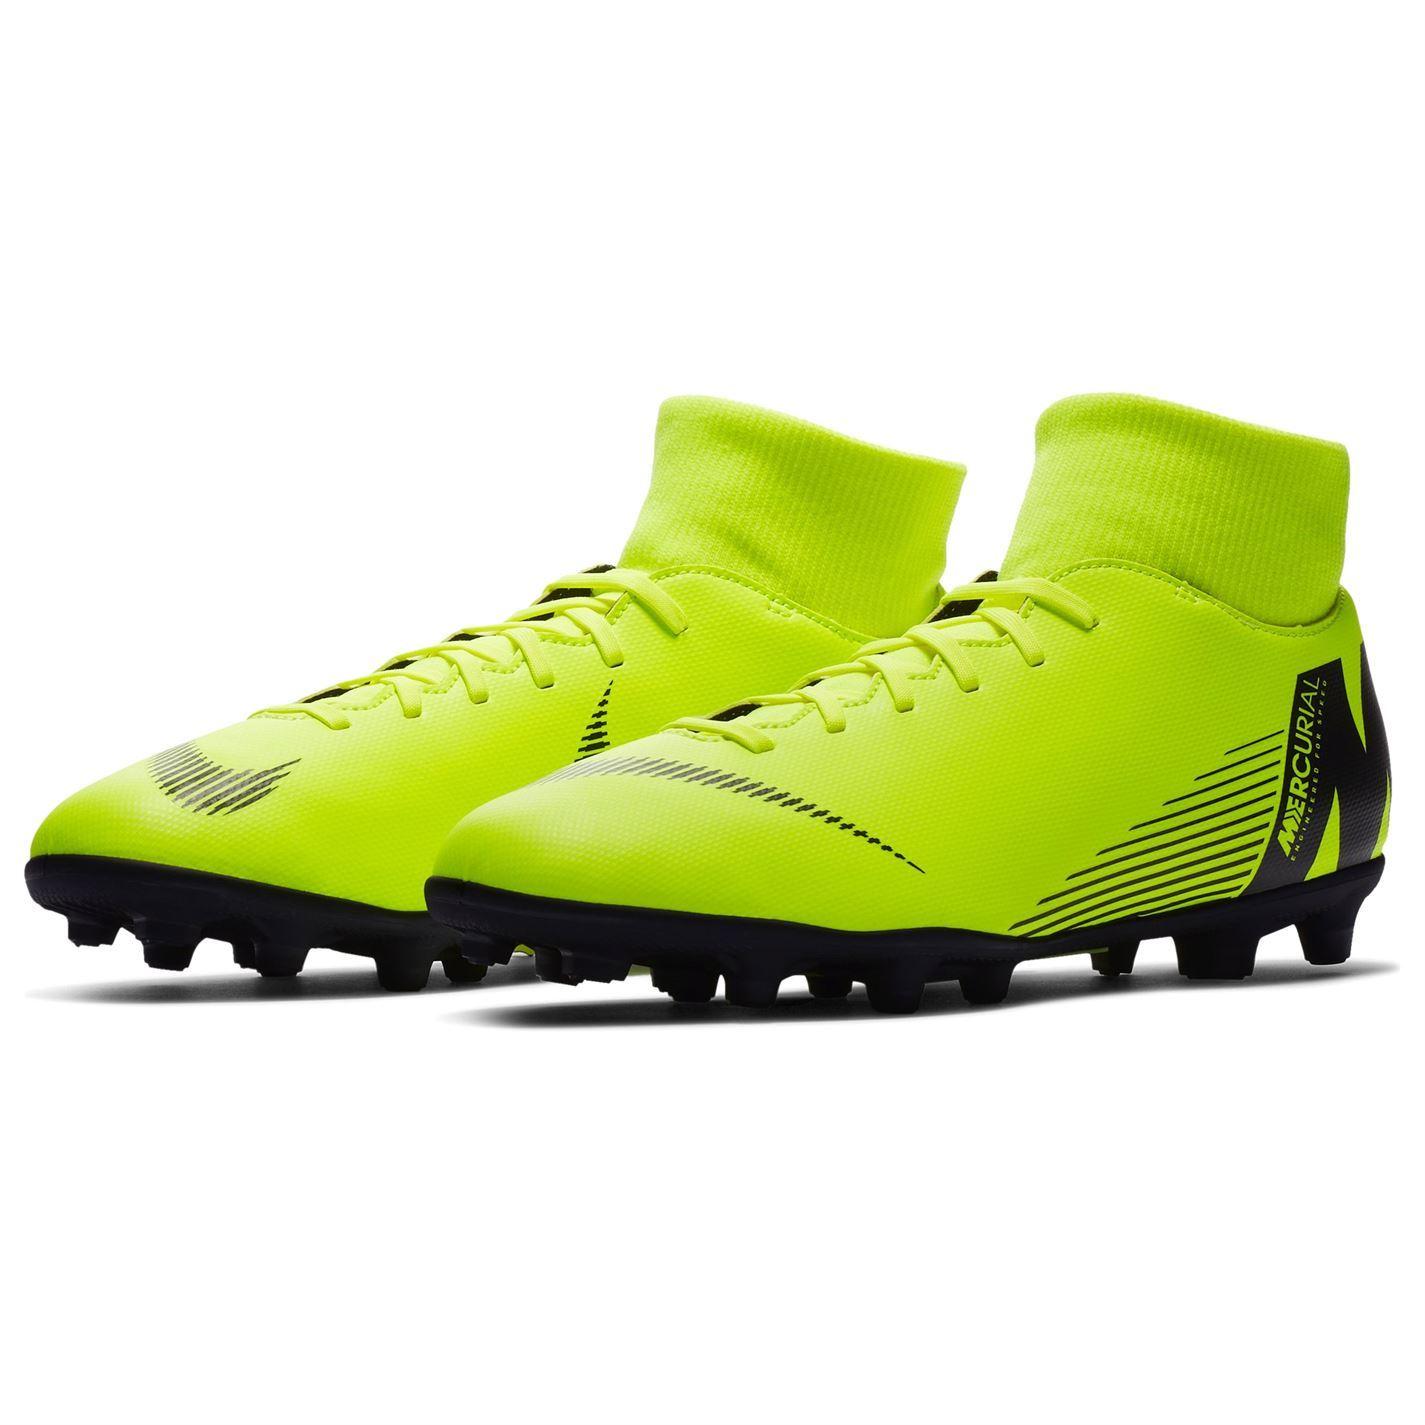 Men's Nike Football Boots Nike Mercurial Superfly V DF SG